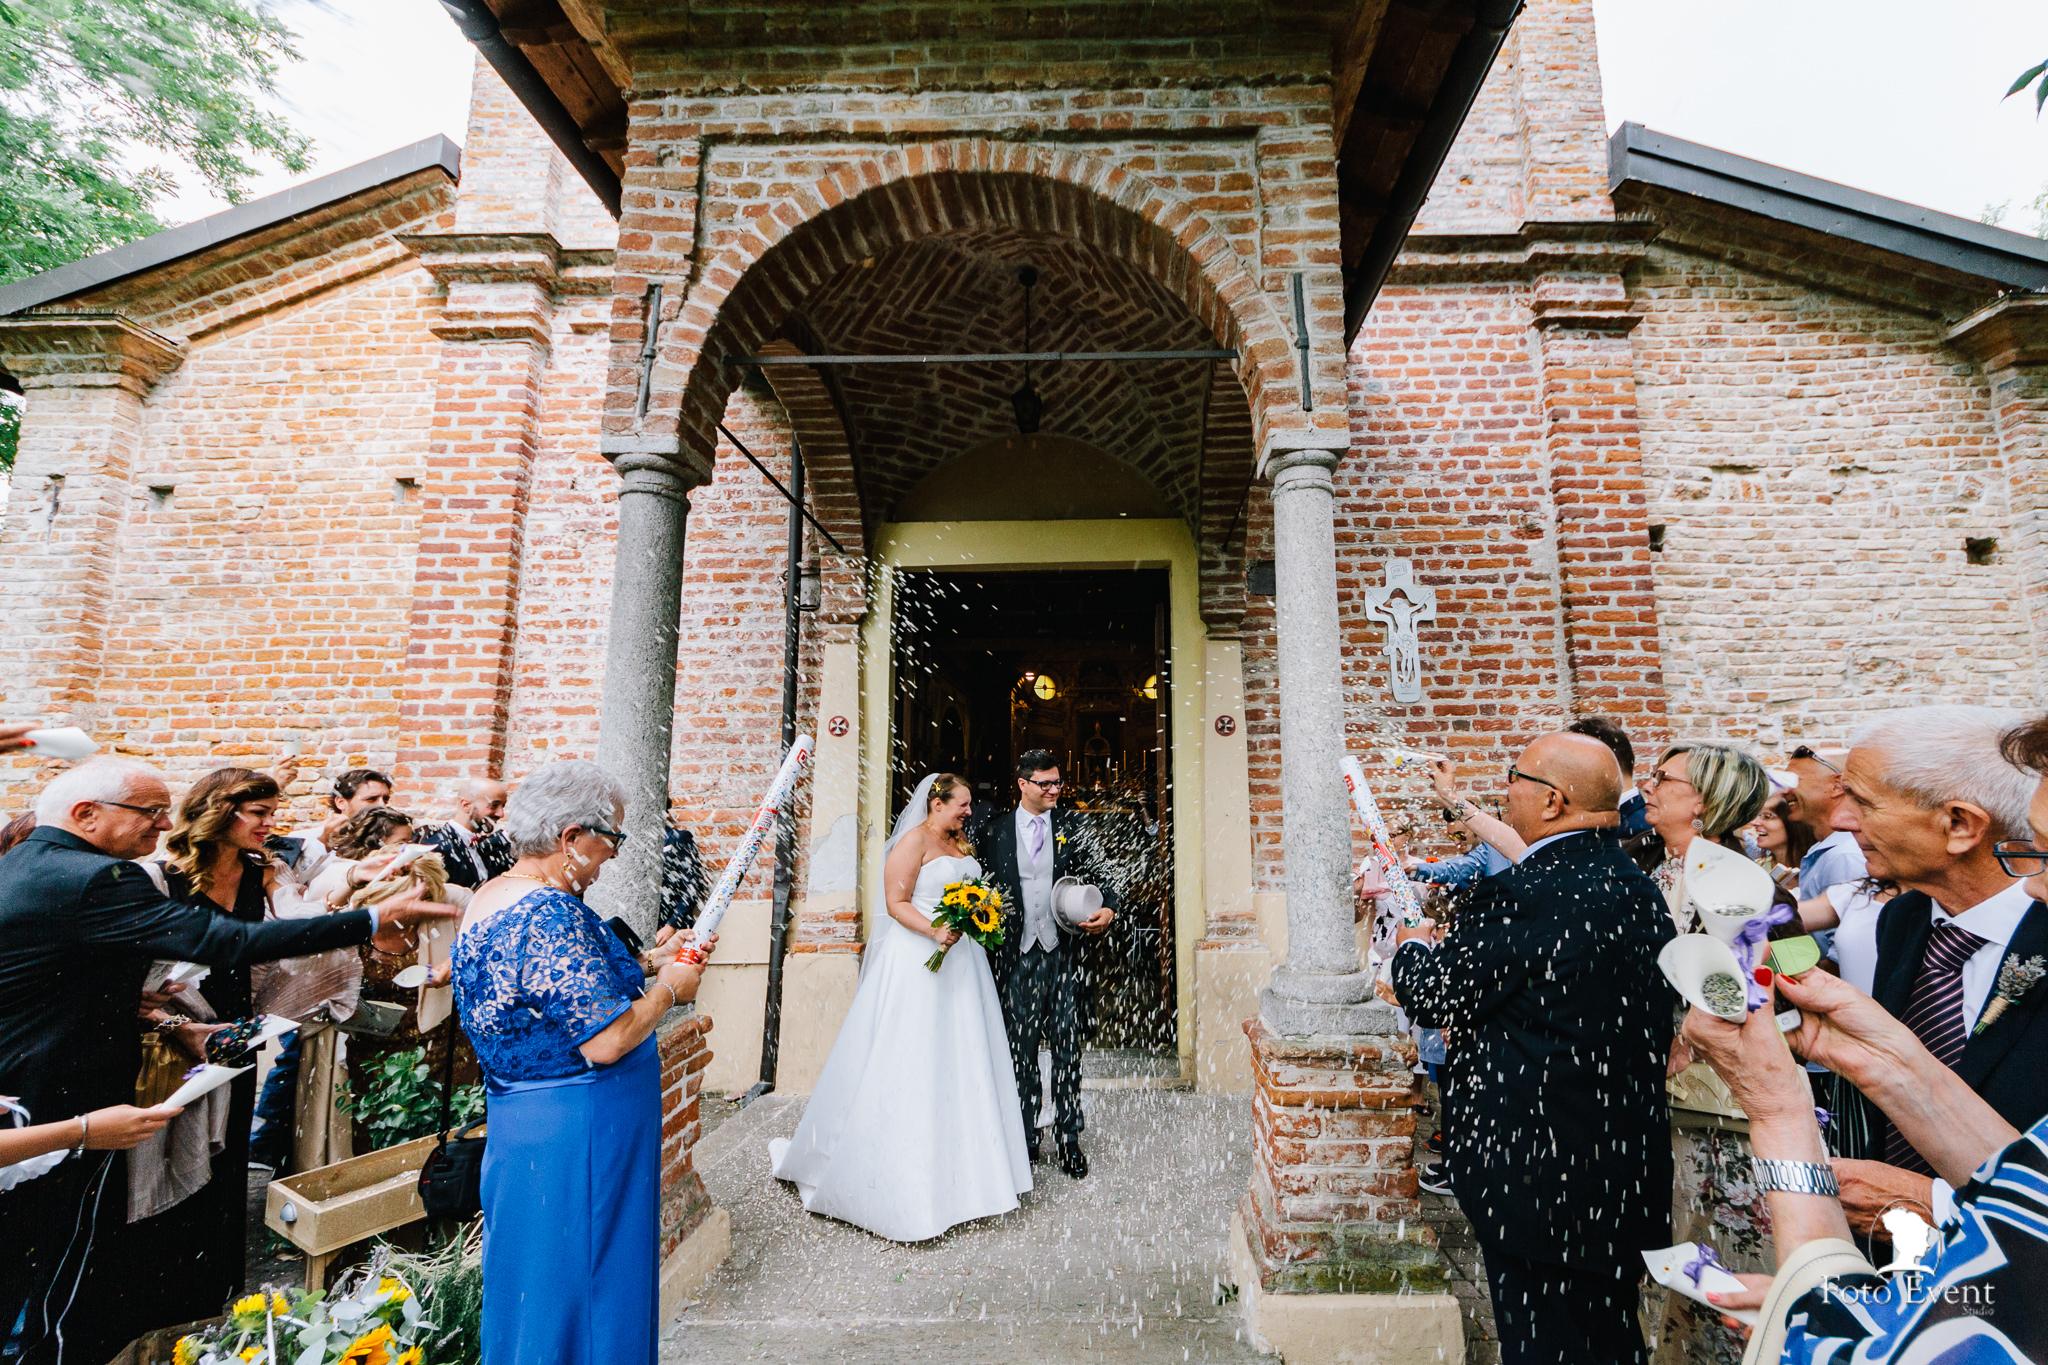 048-2019-07-27-Matrimonio-Valentina-e-Alessandro-Pettinari-zoom-462